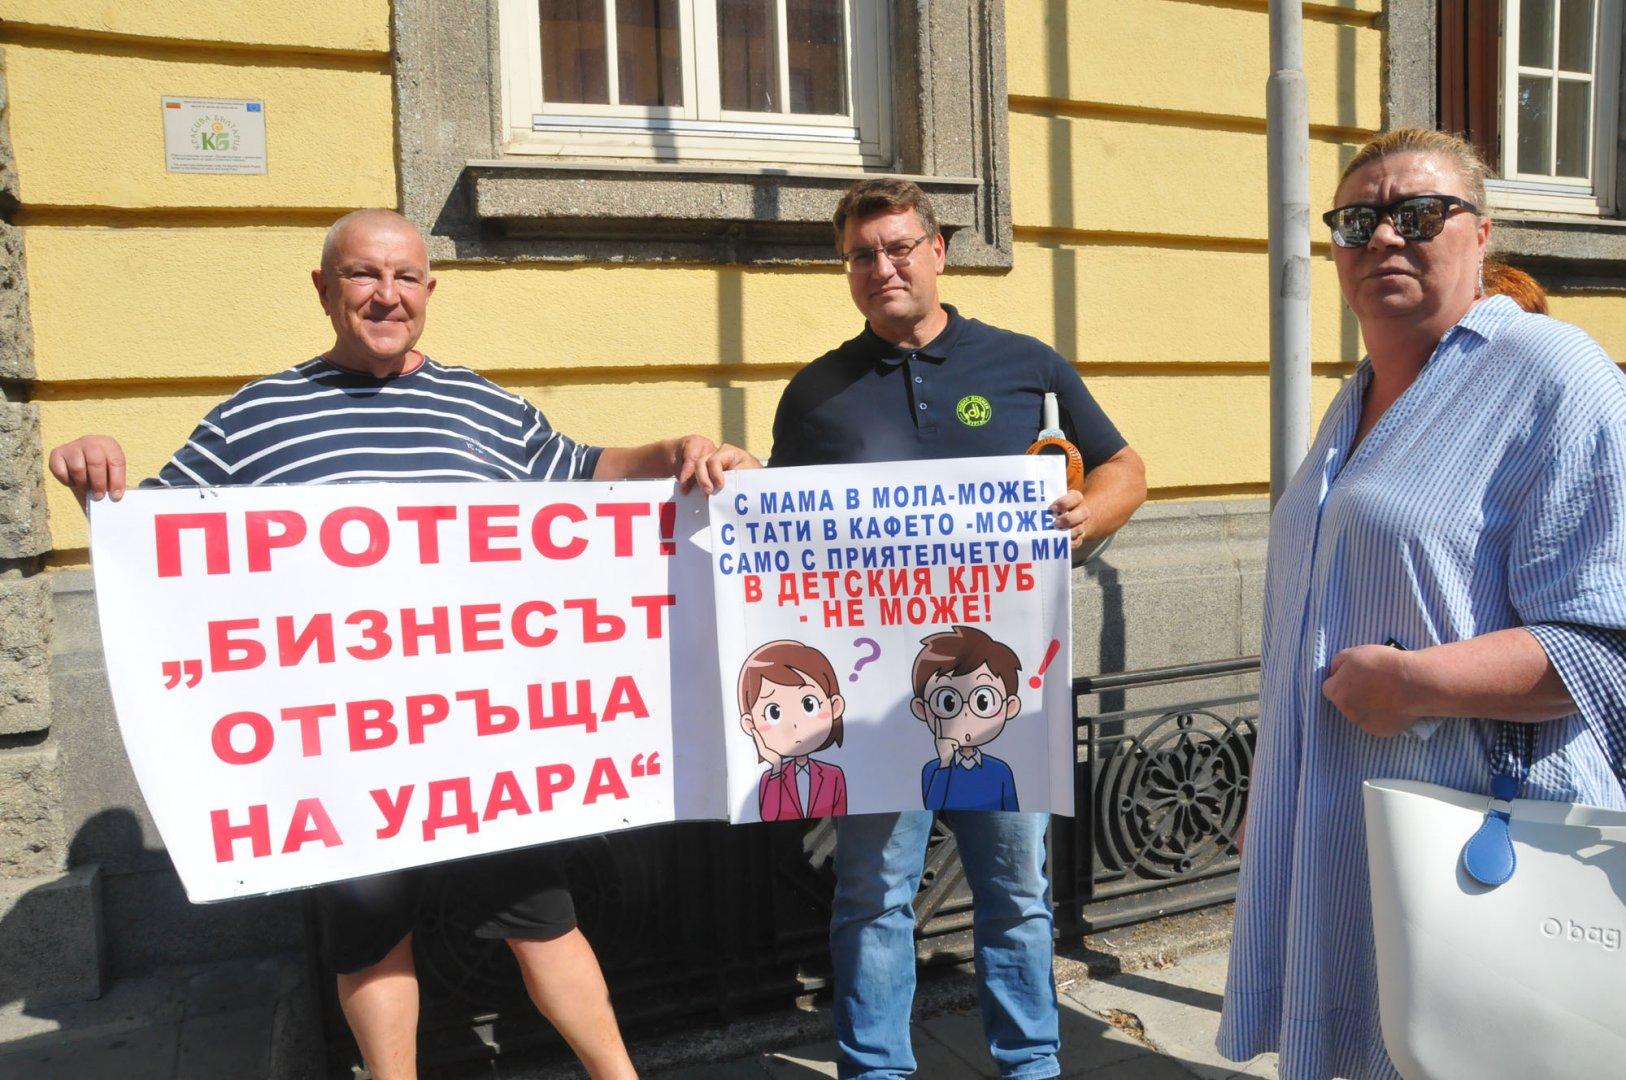 Георги Мицов (вляво) и Христина Секлемова се включиха в протеста на бранша. Снимки Черноморие-бг